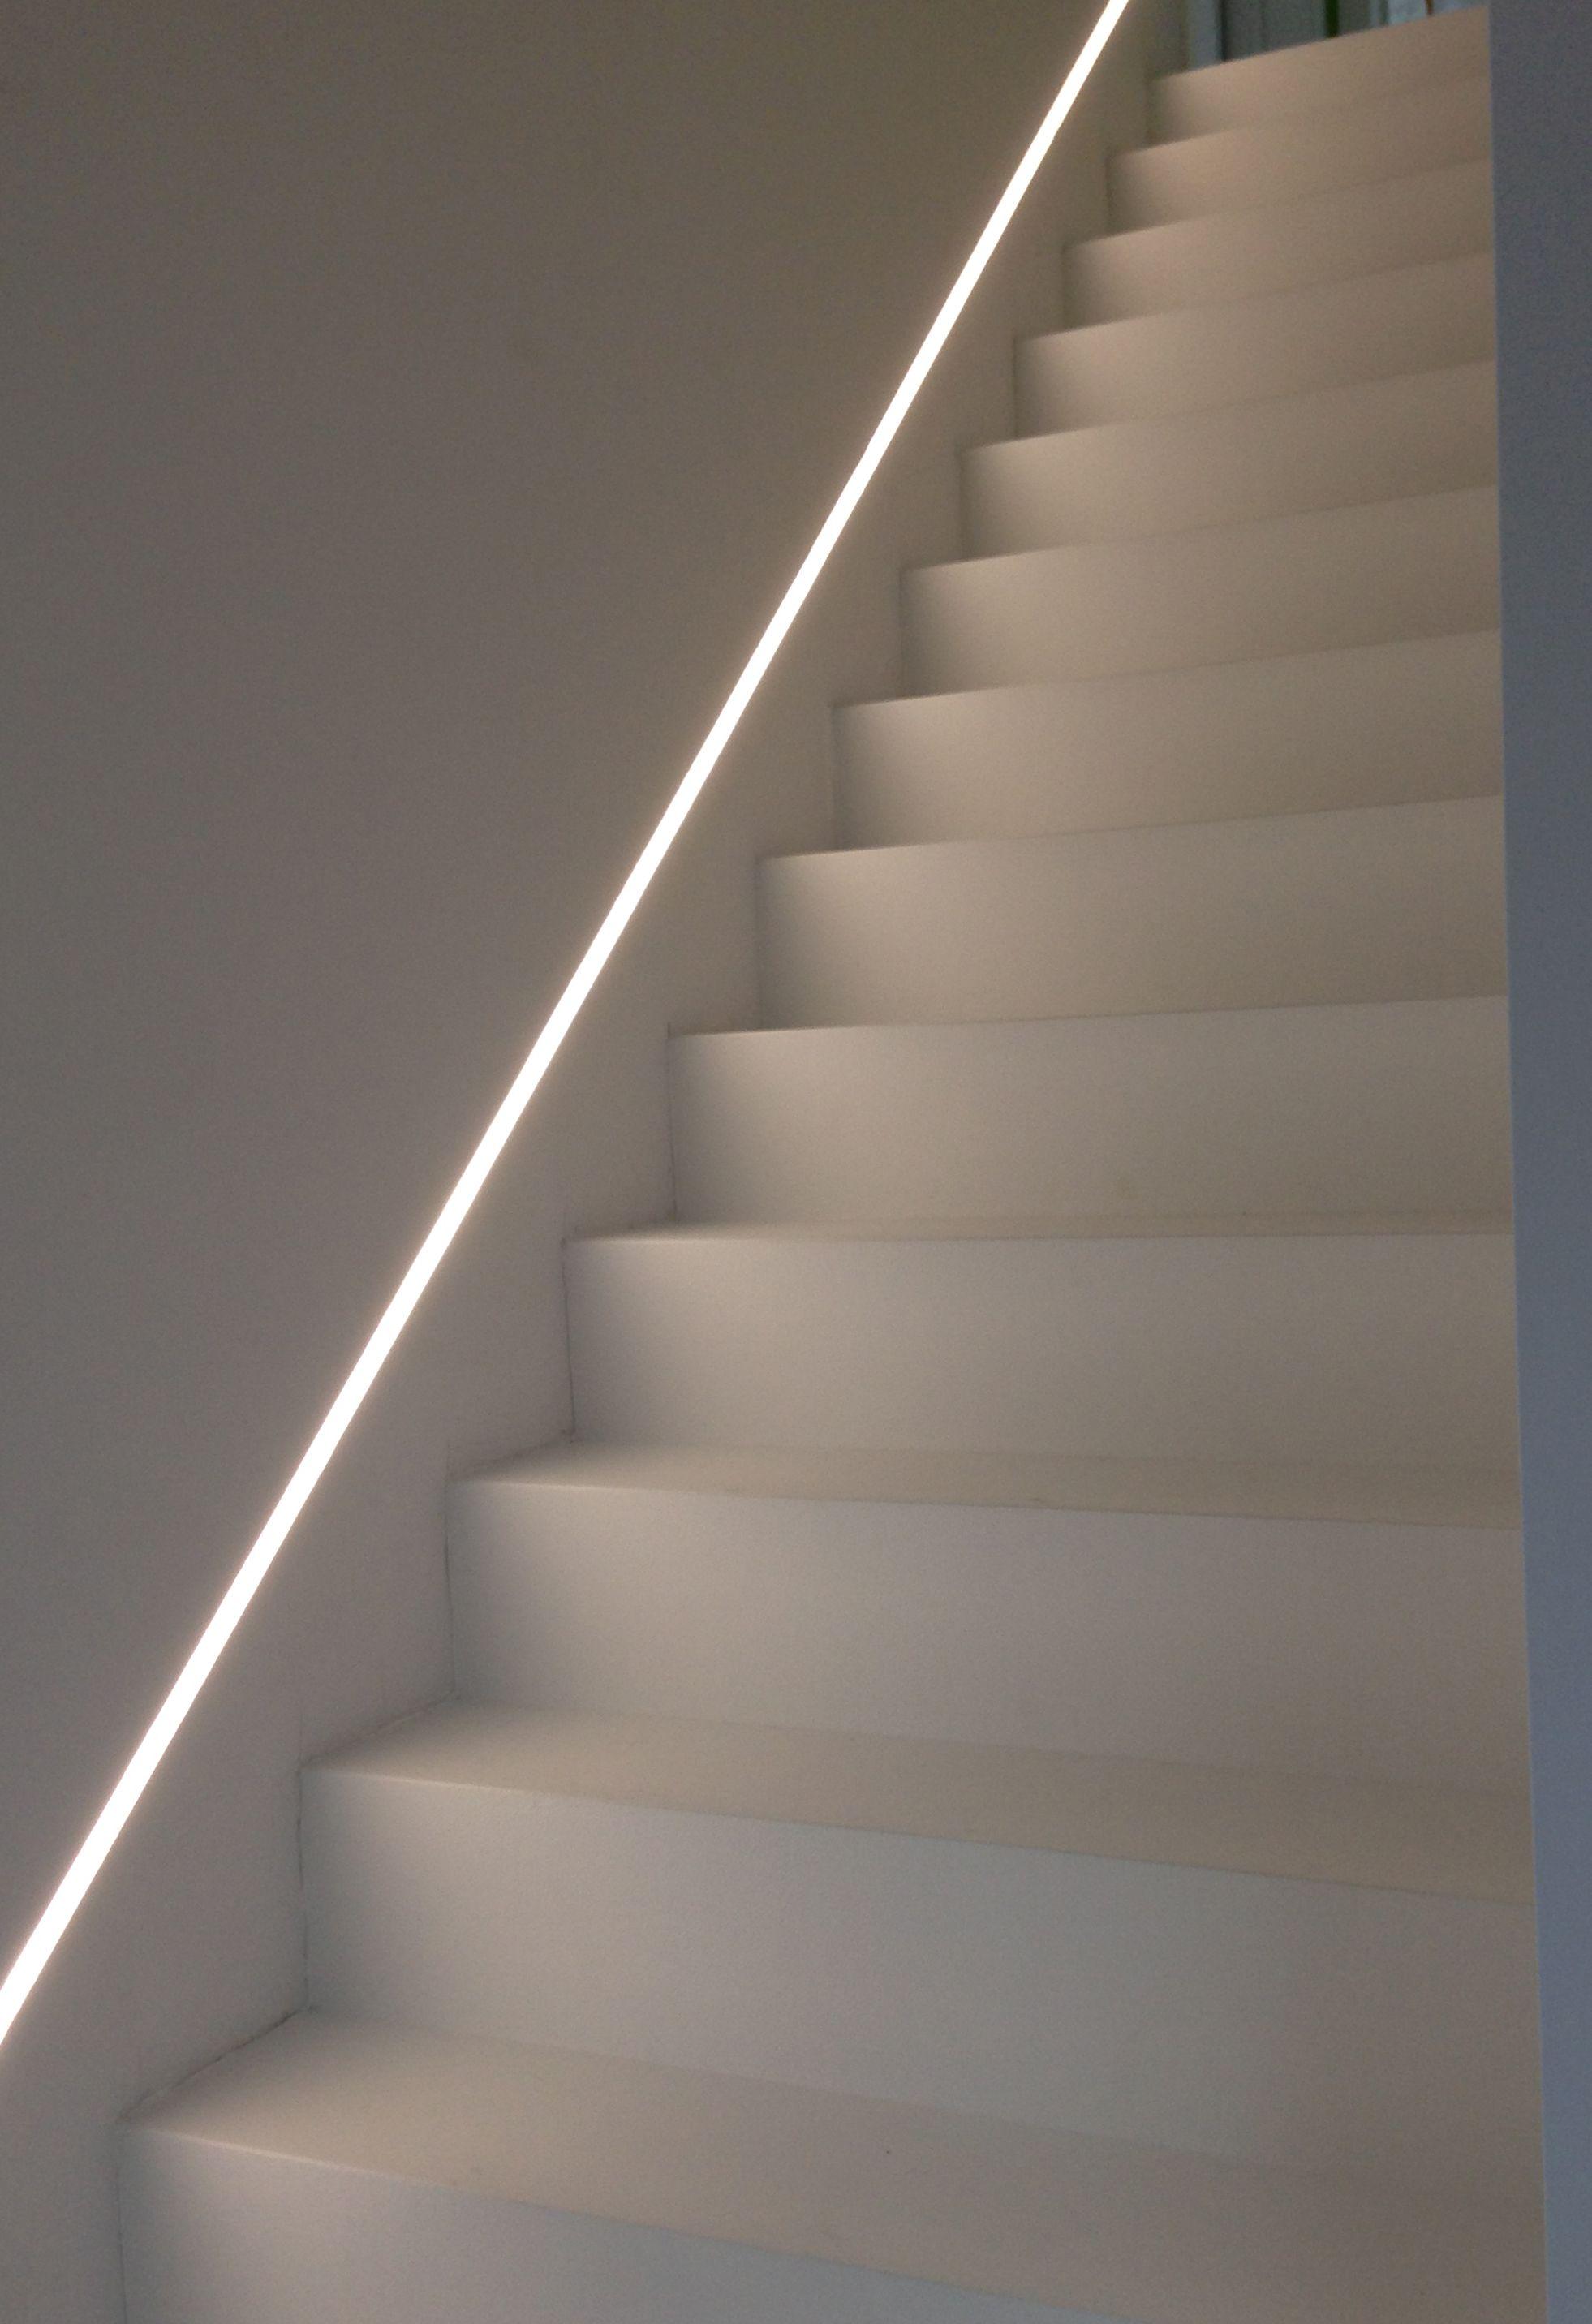 LED Inbouwspots Boven De Trap - Veilig & Klassevol | Pinterest ...